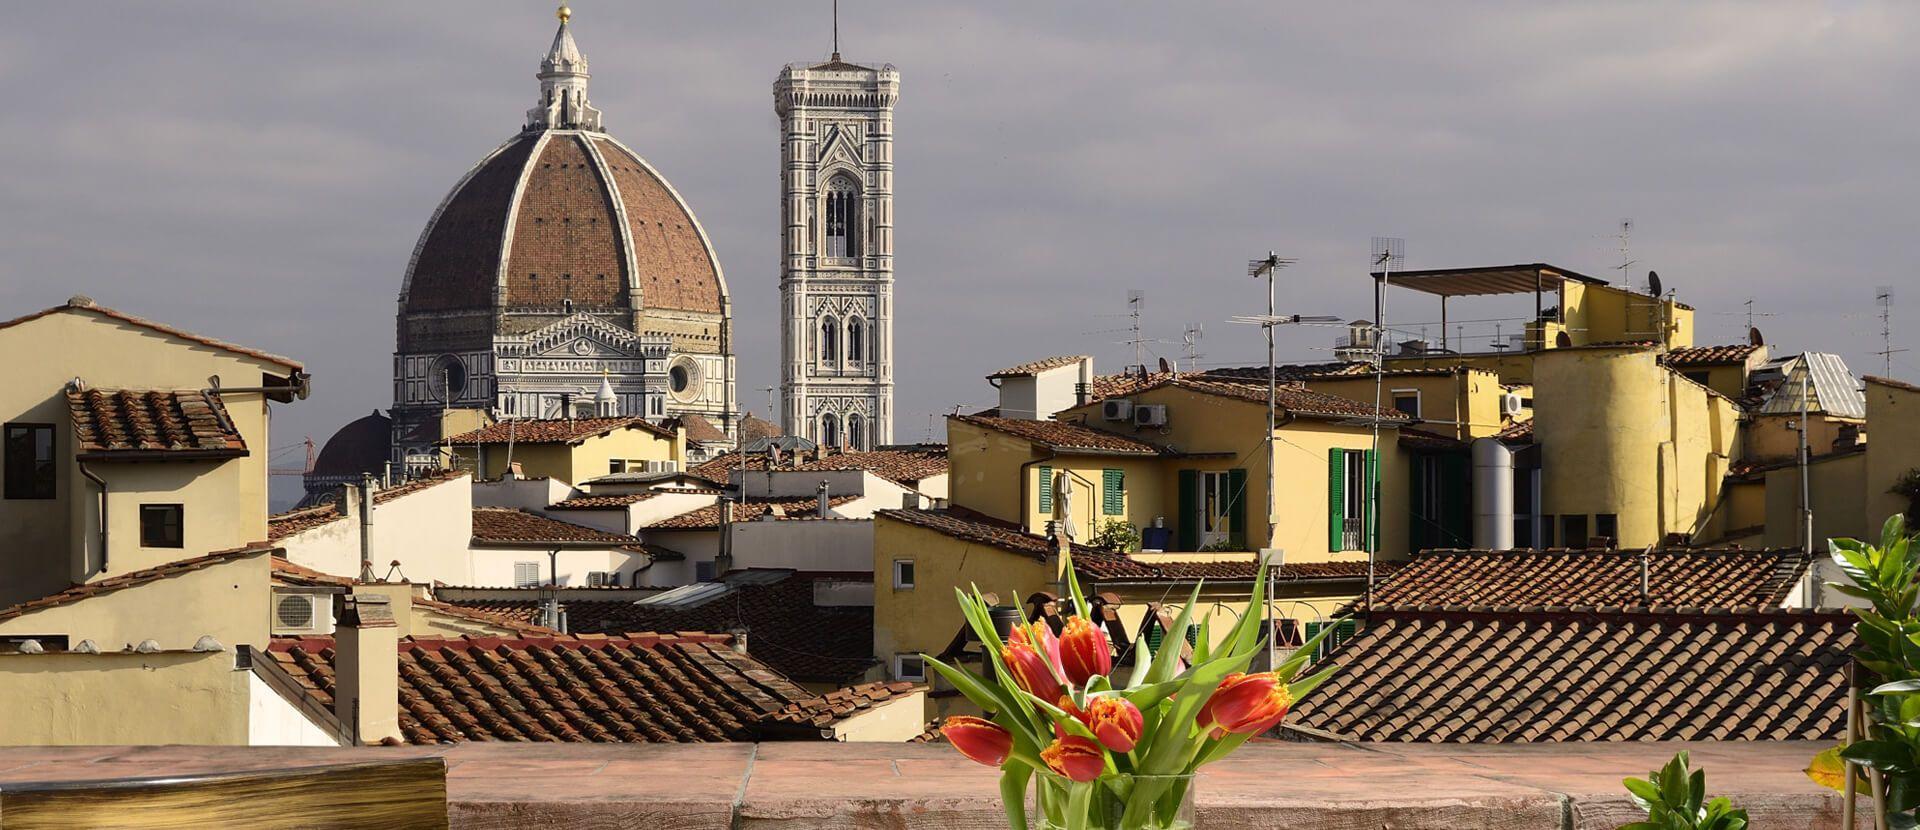 L'Orologio Firenze